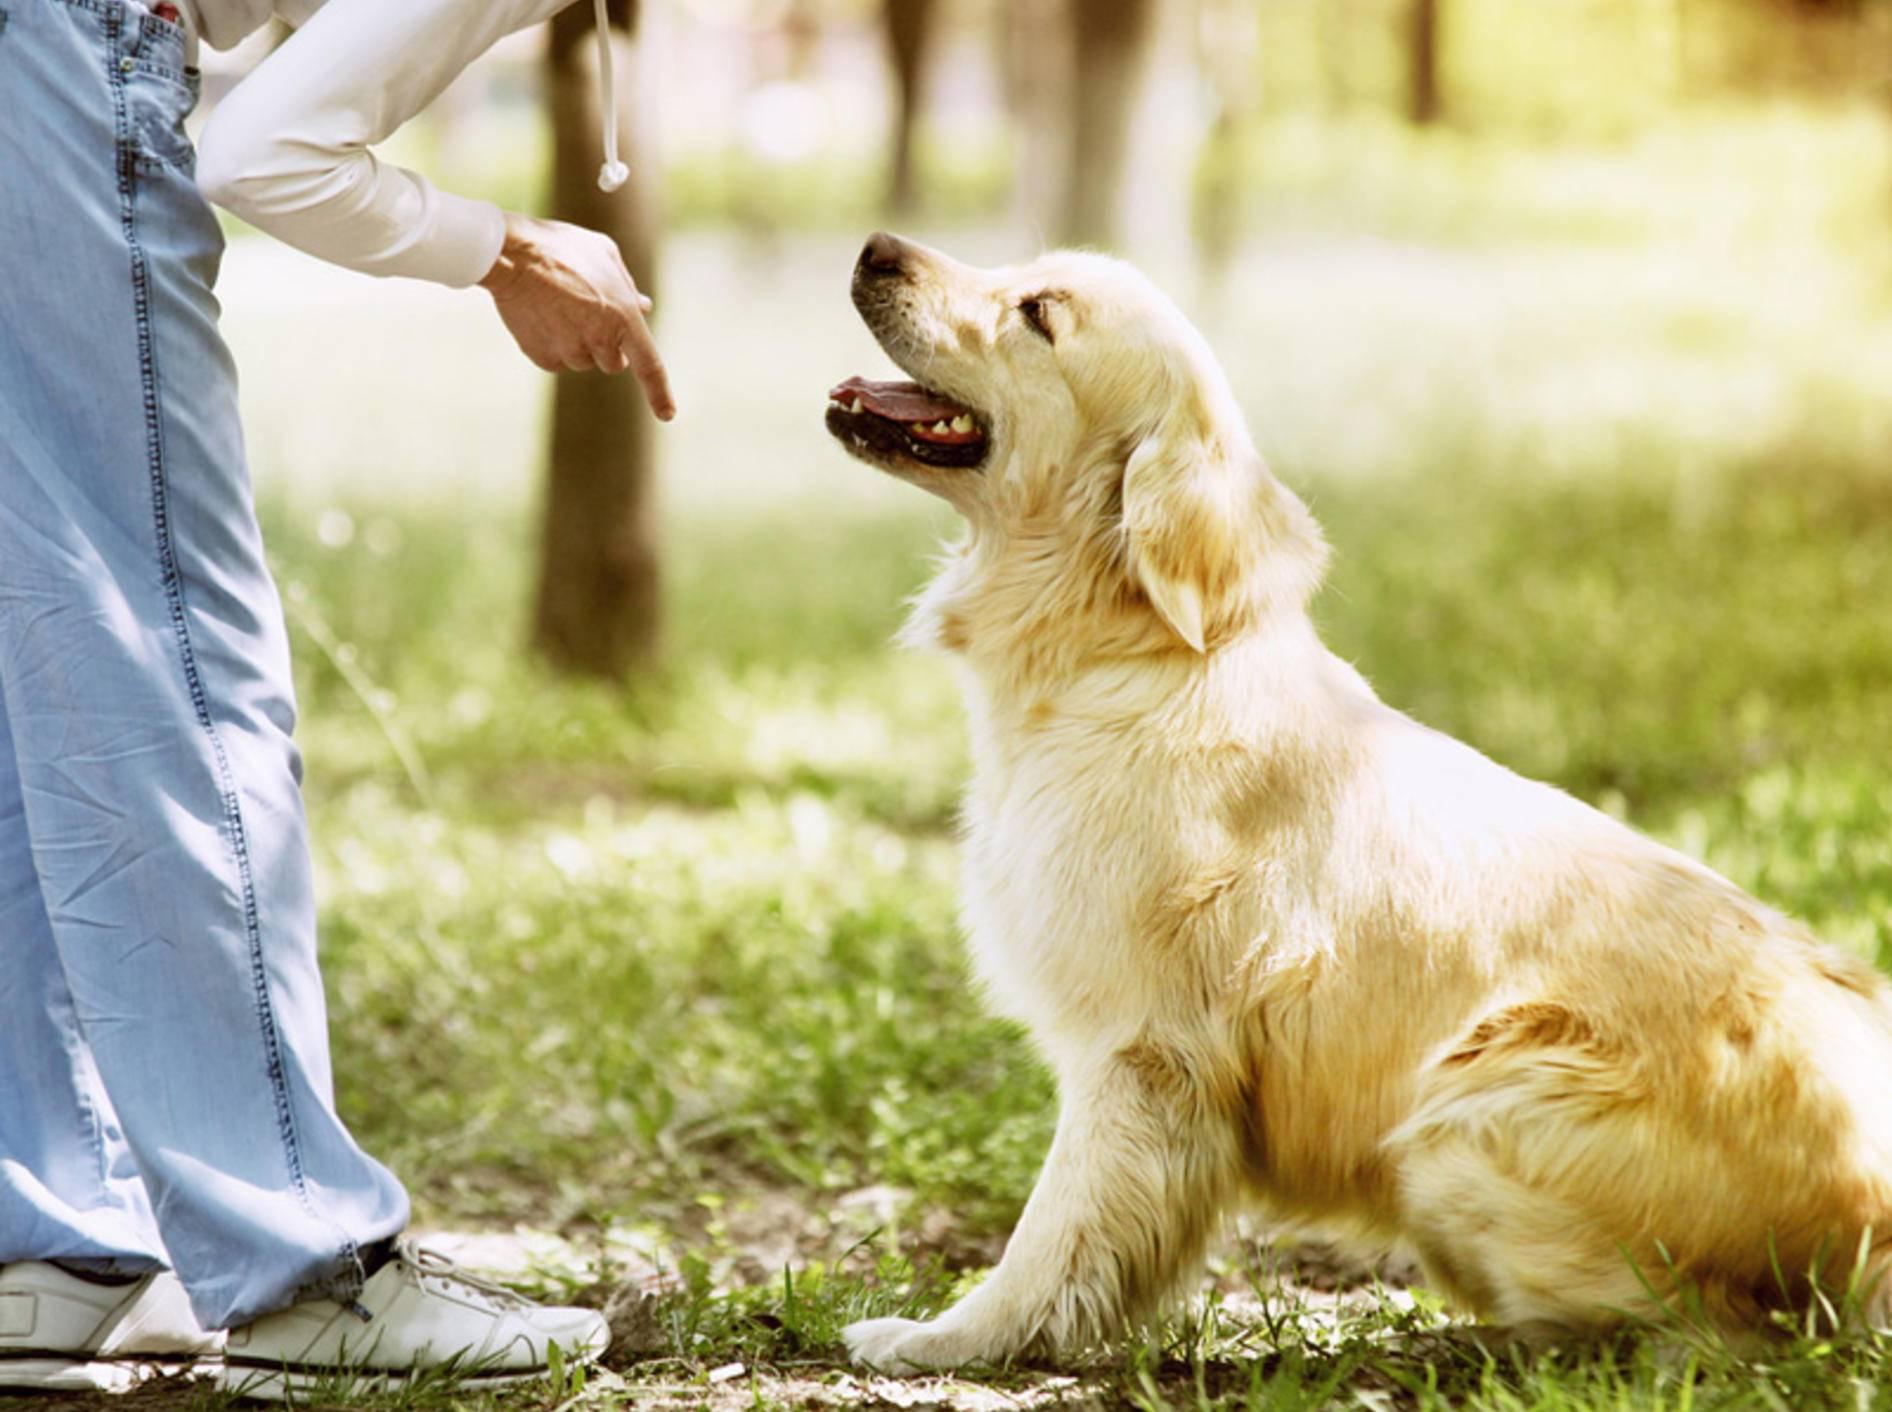 Mit positiver Verstärkung soll die Hundeerziehung leichter funktionieren – Shutterstock / Soloviova Liudmyla